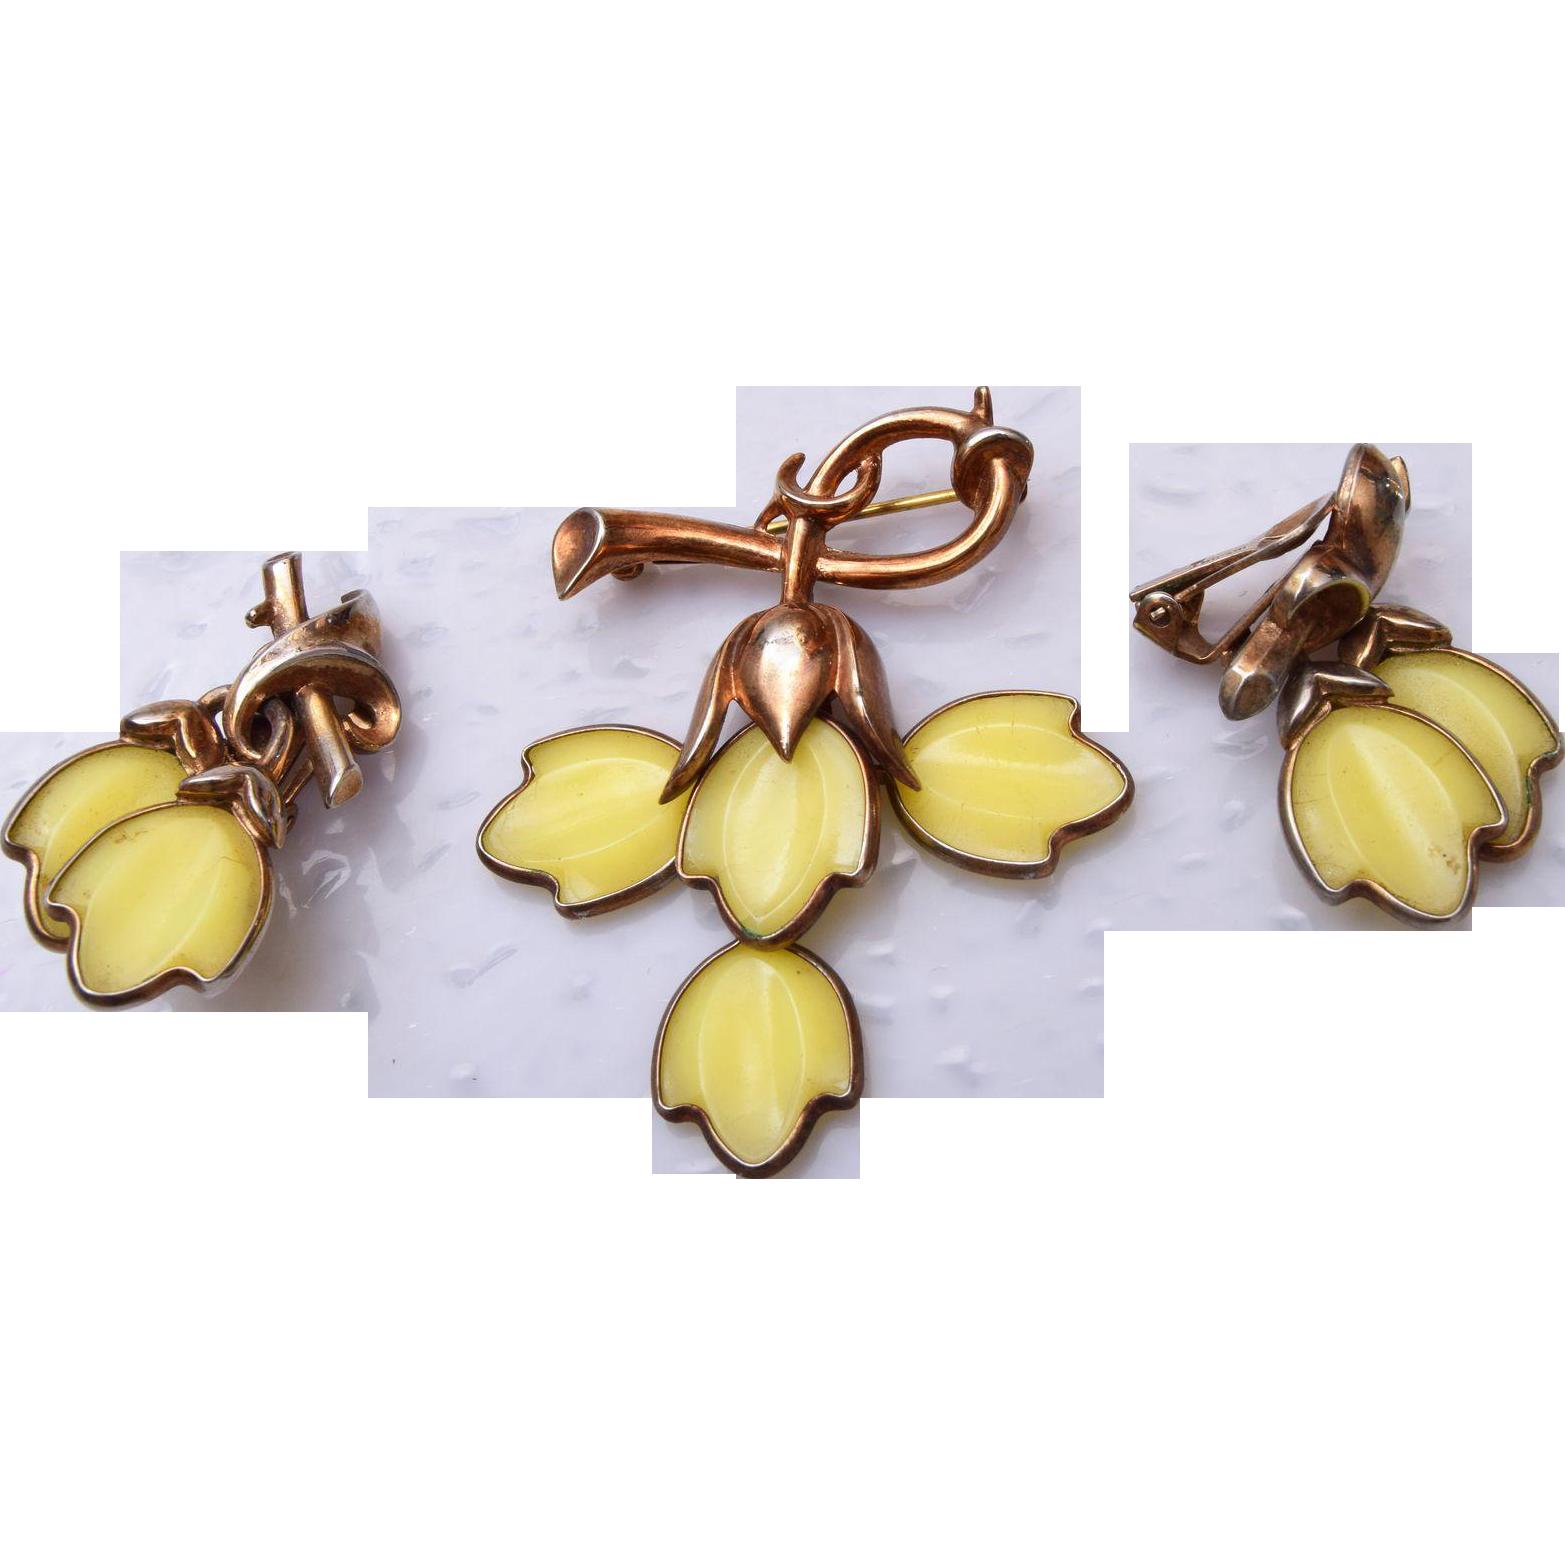 Trifari Yellow Dogwood Brooch and Earring Set